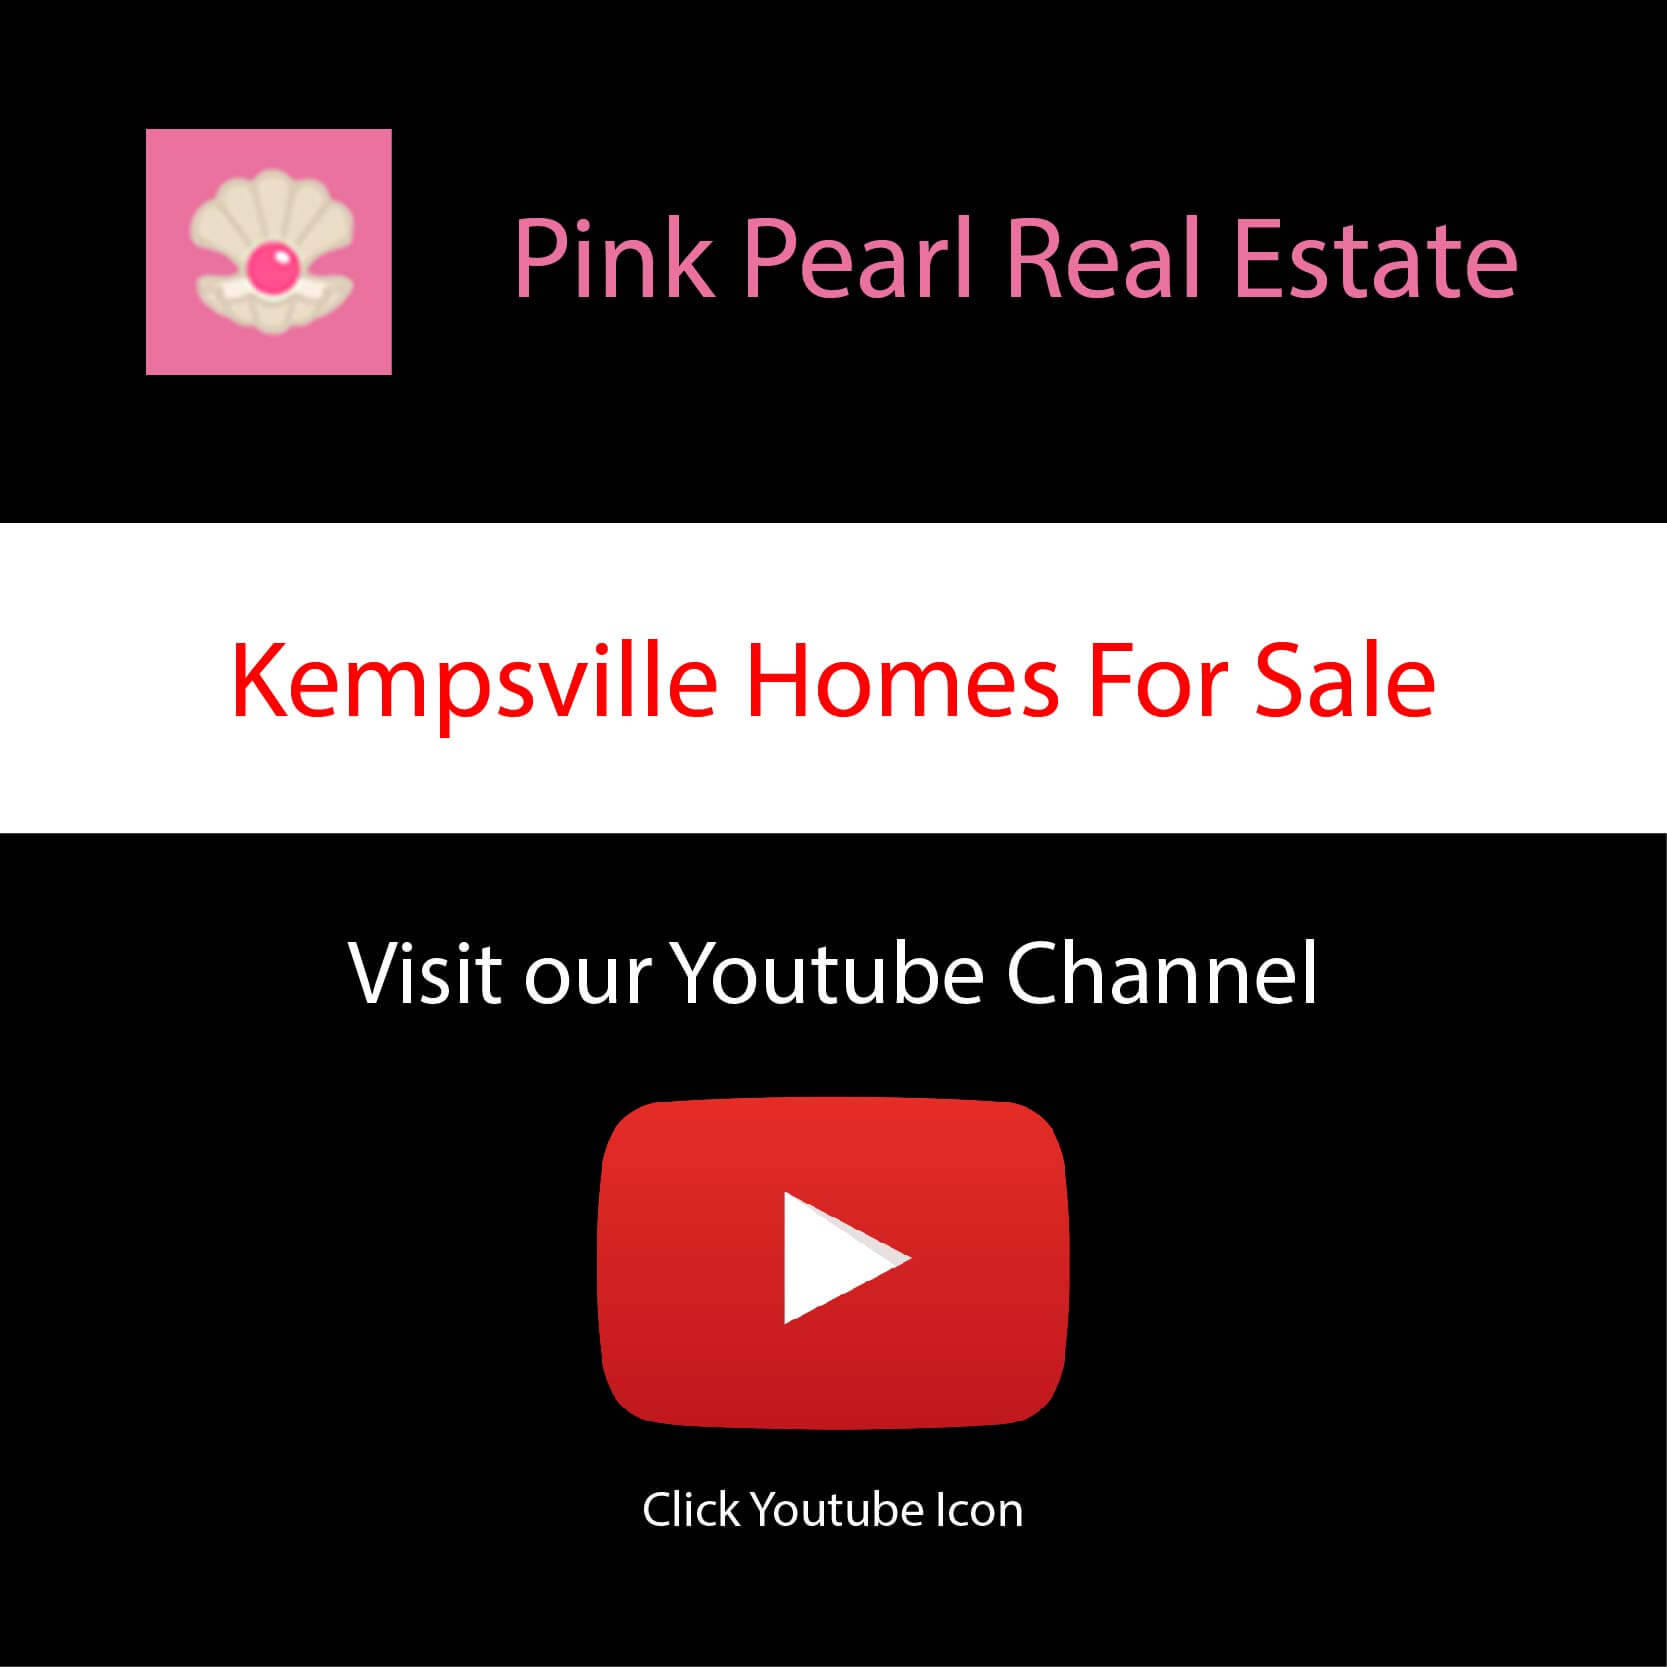 Visit Kempsville Homes For Sale on Youtube